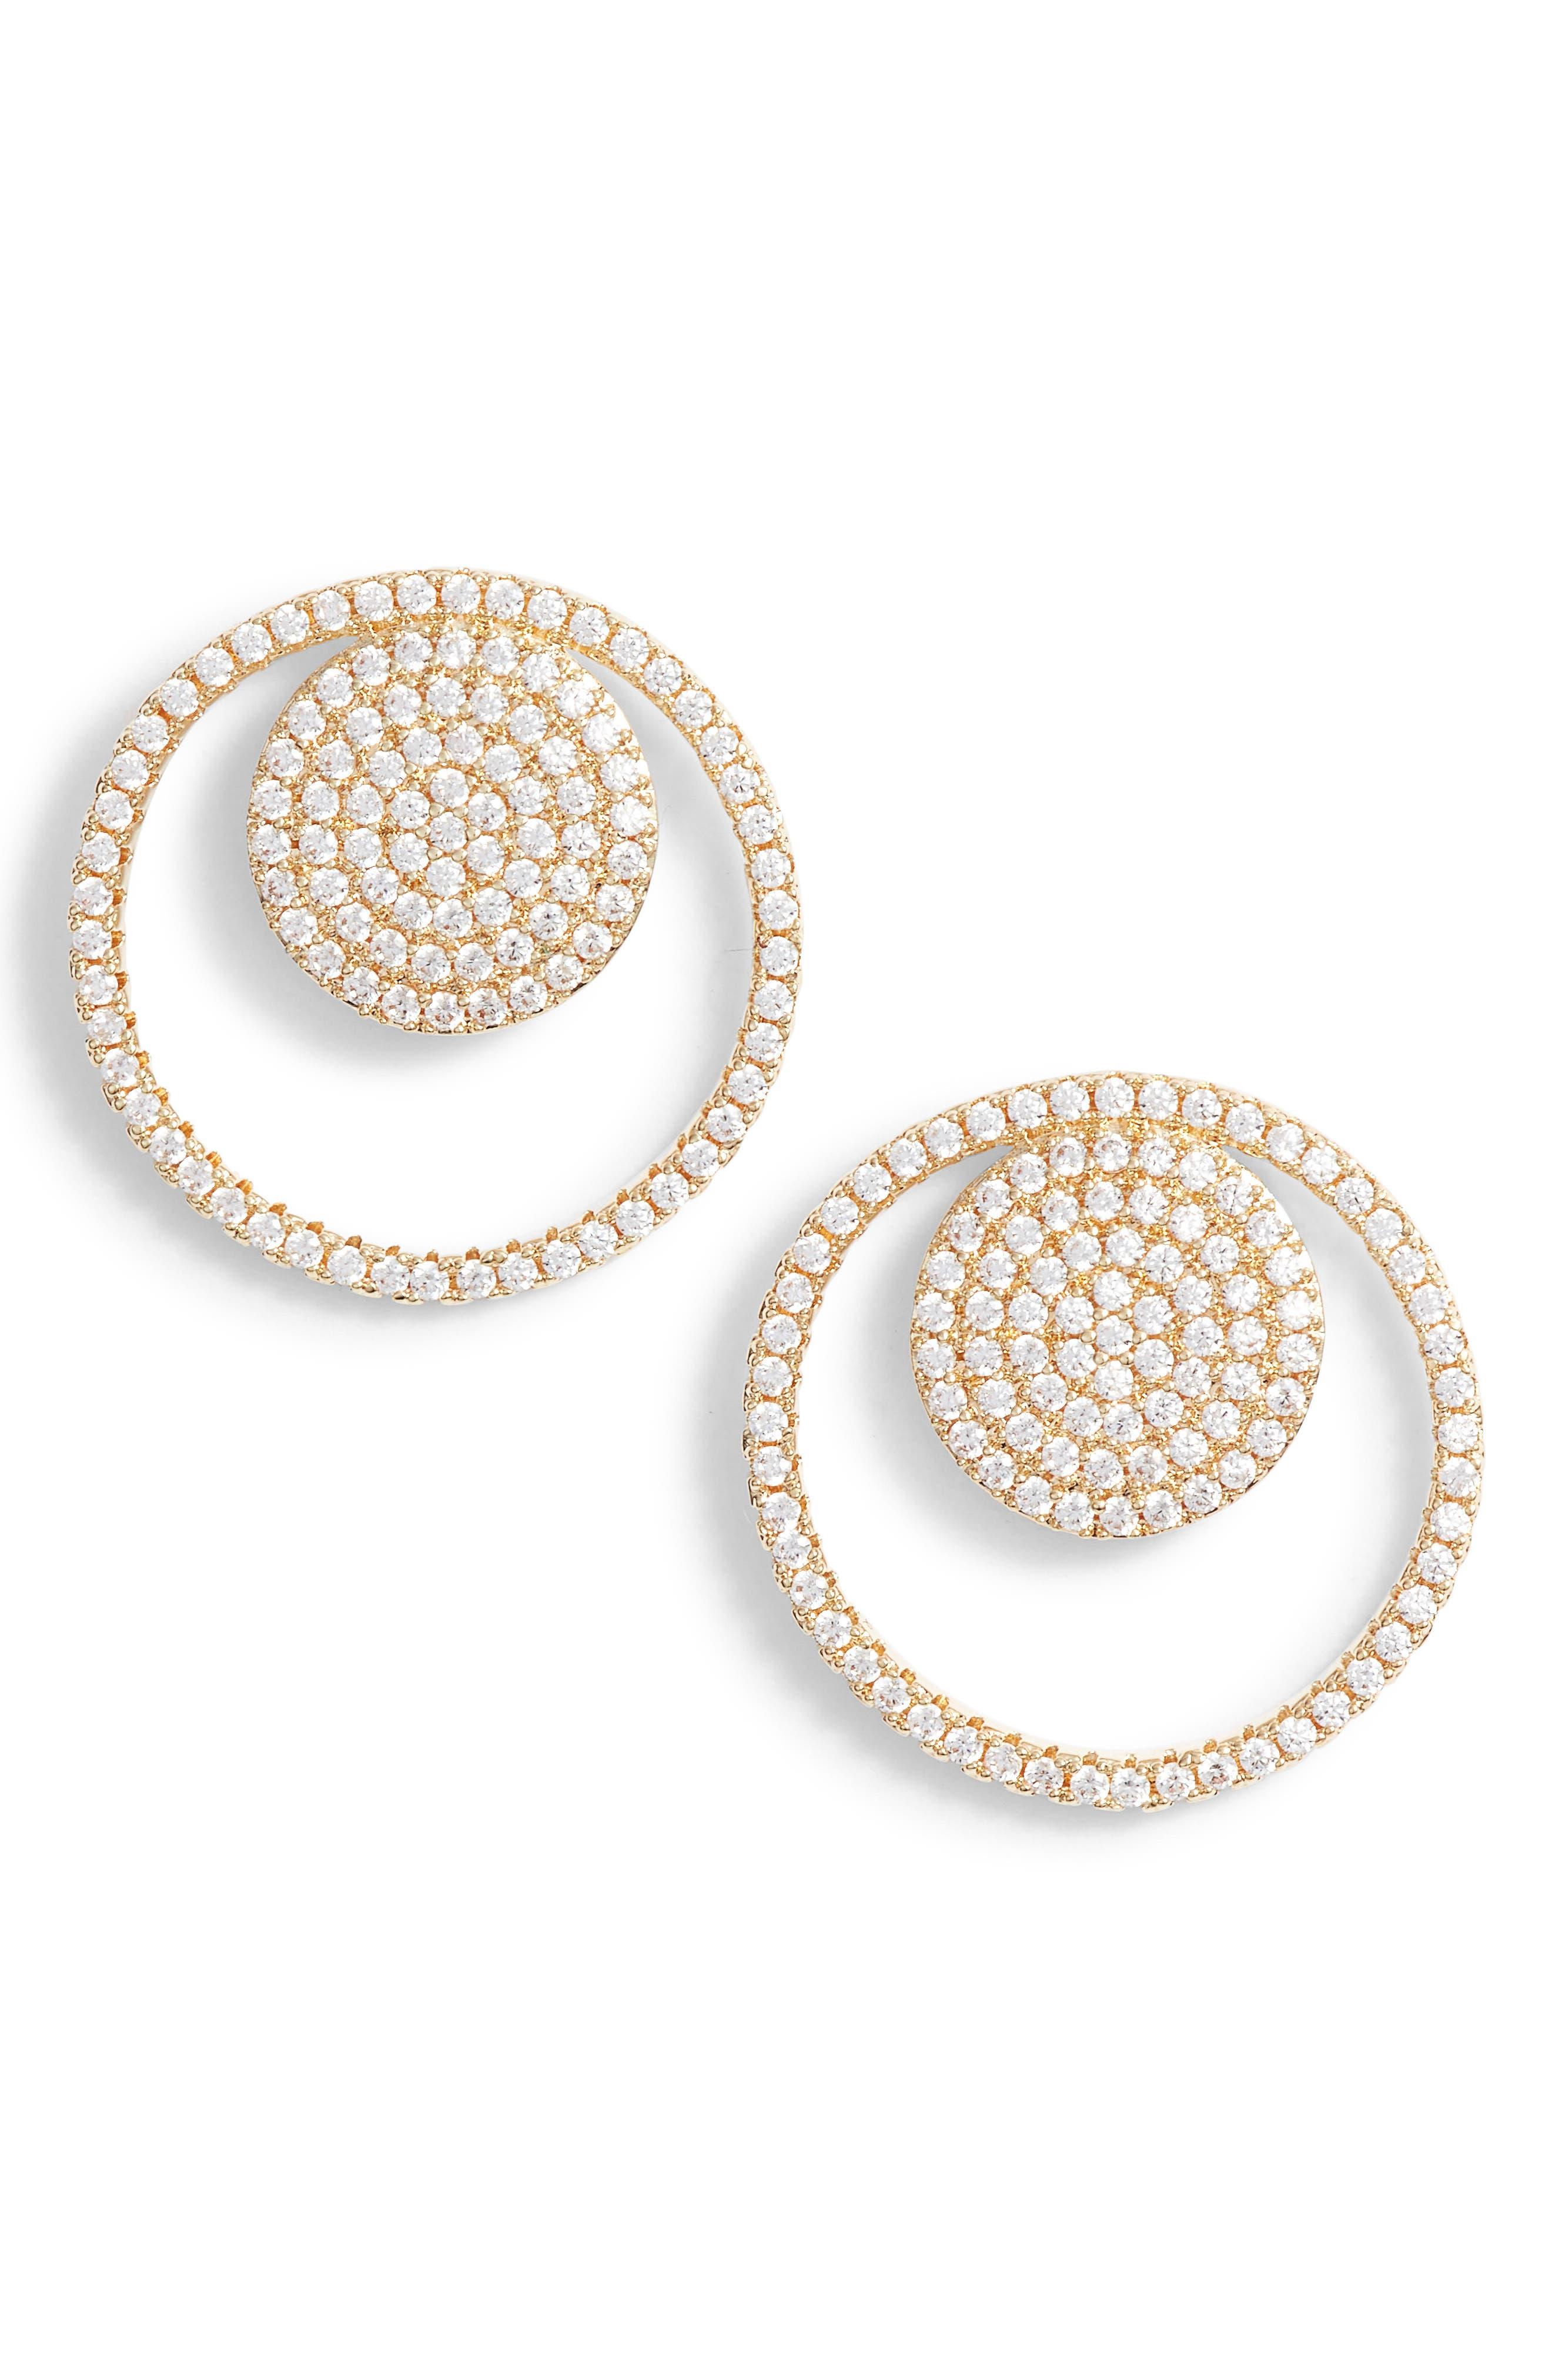 Pavé Spheres Frontal Hoop Earrings,                         Main,                         color, CLEAR/ GOLD